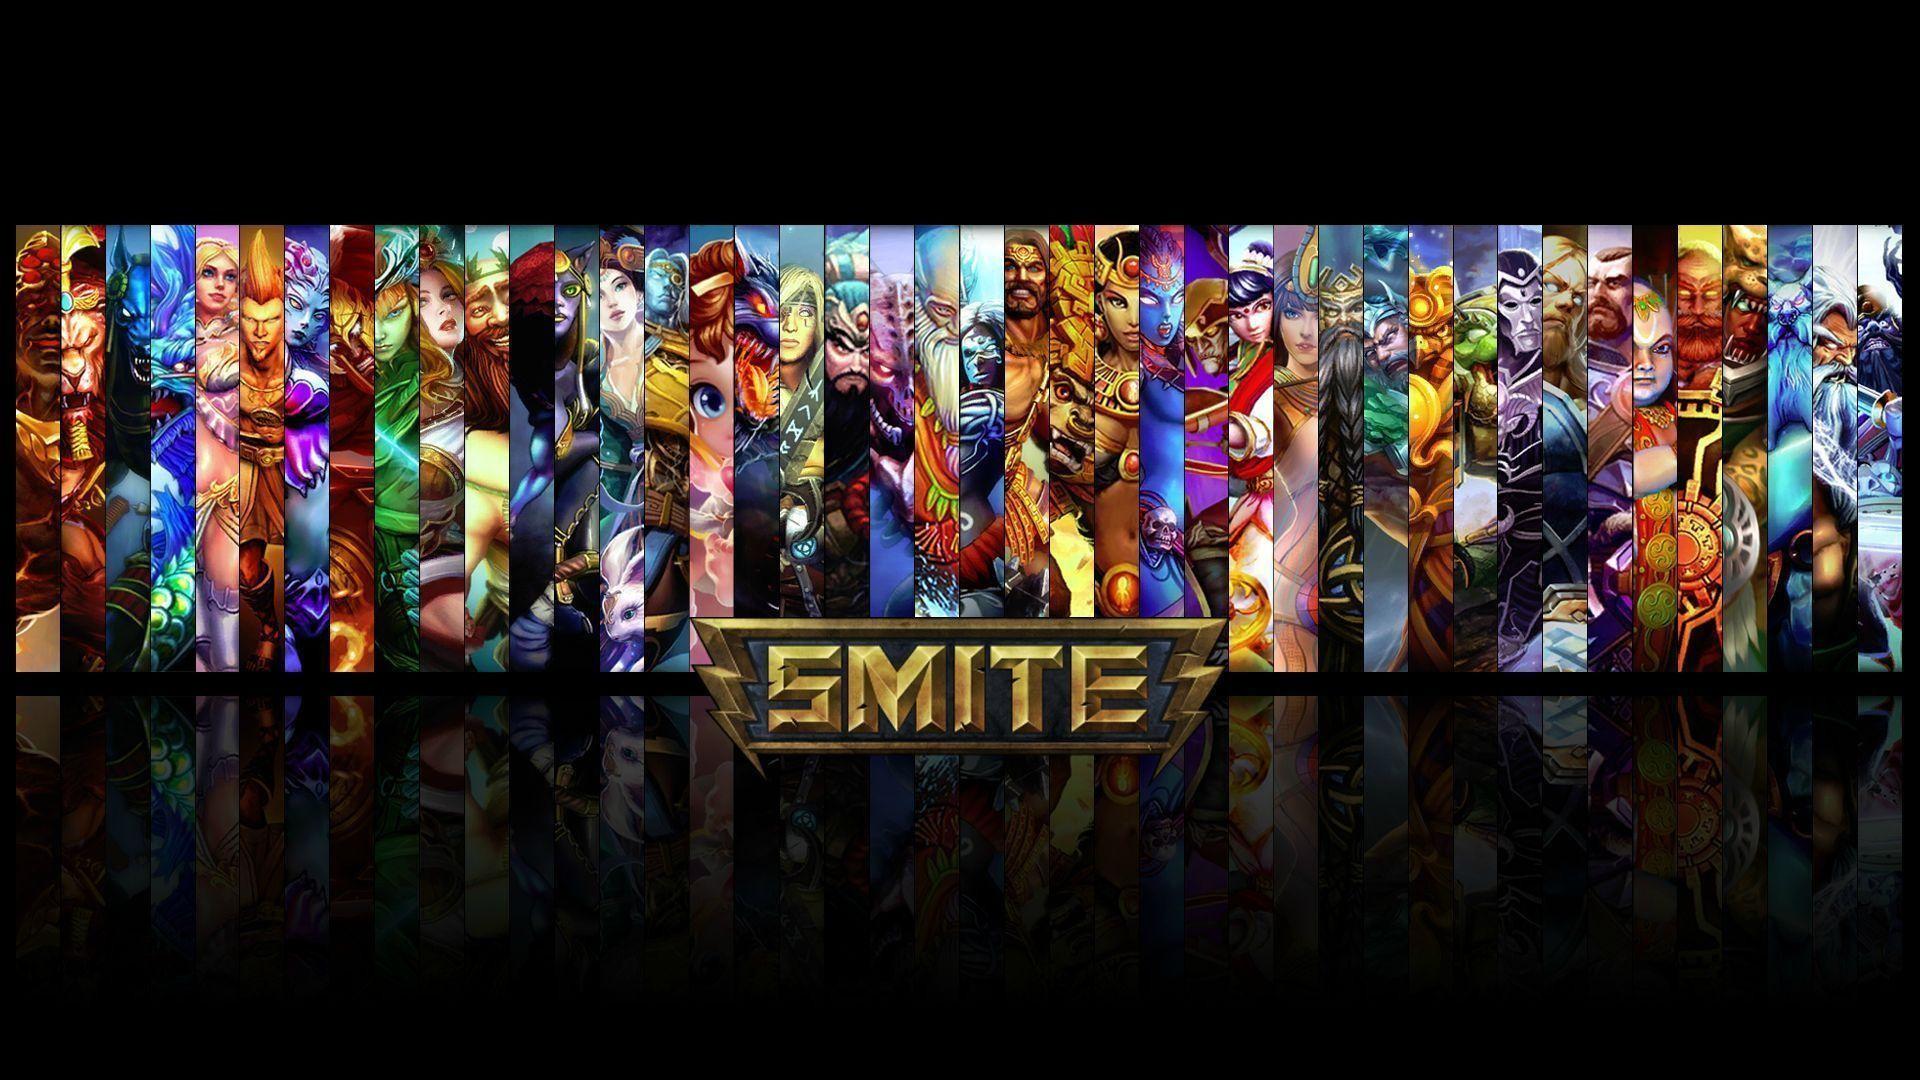 New Smite Wallpaper with ALL GODS – Thanatos Edition : Smite